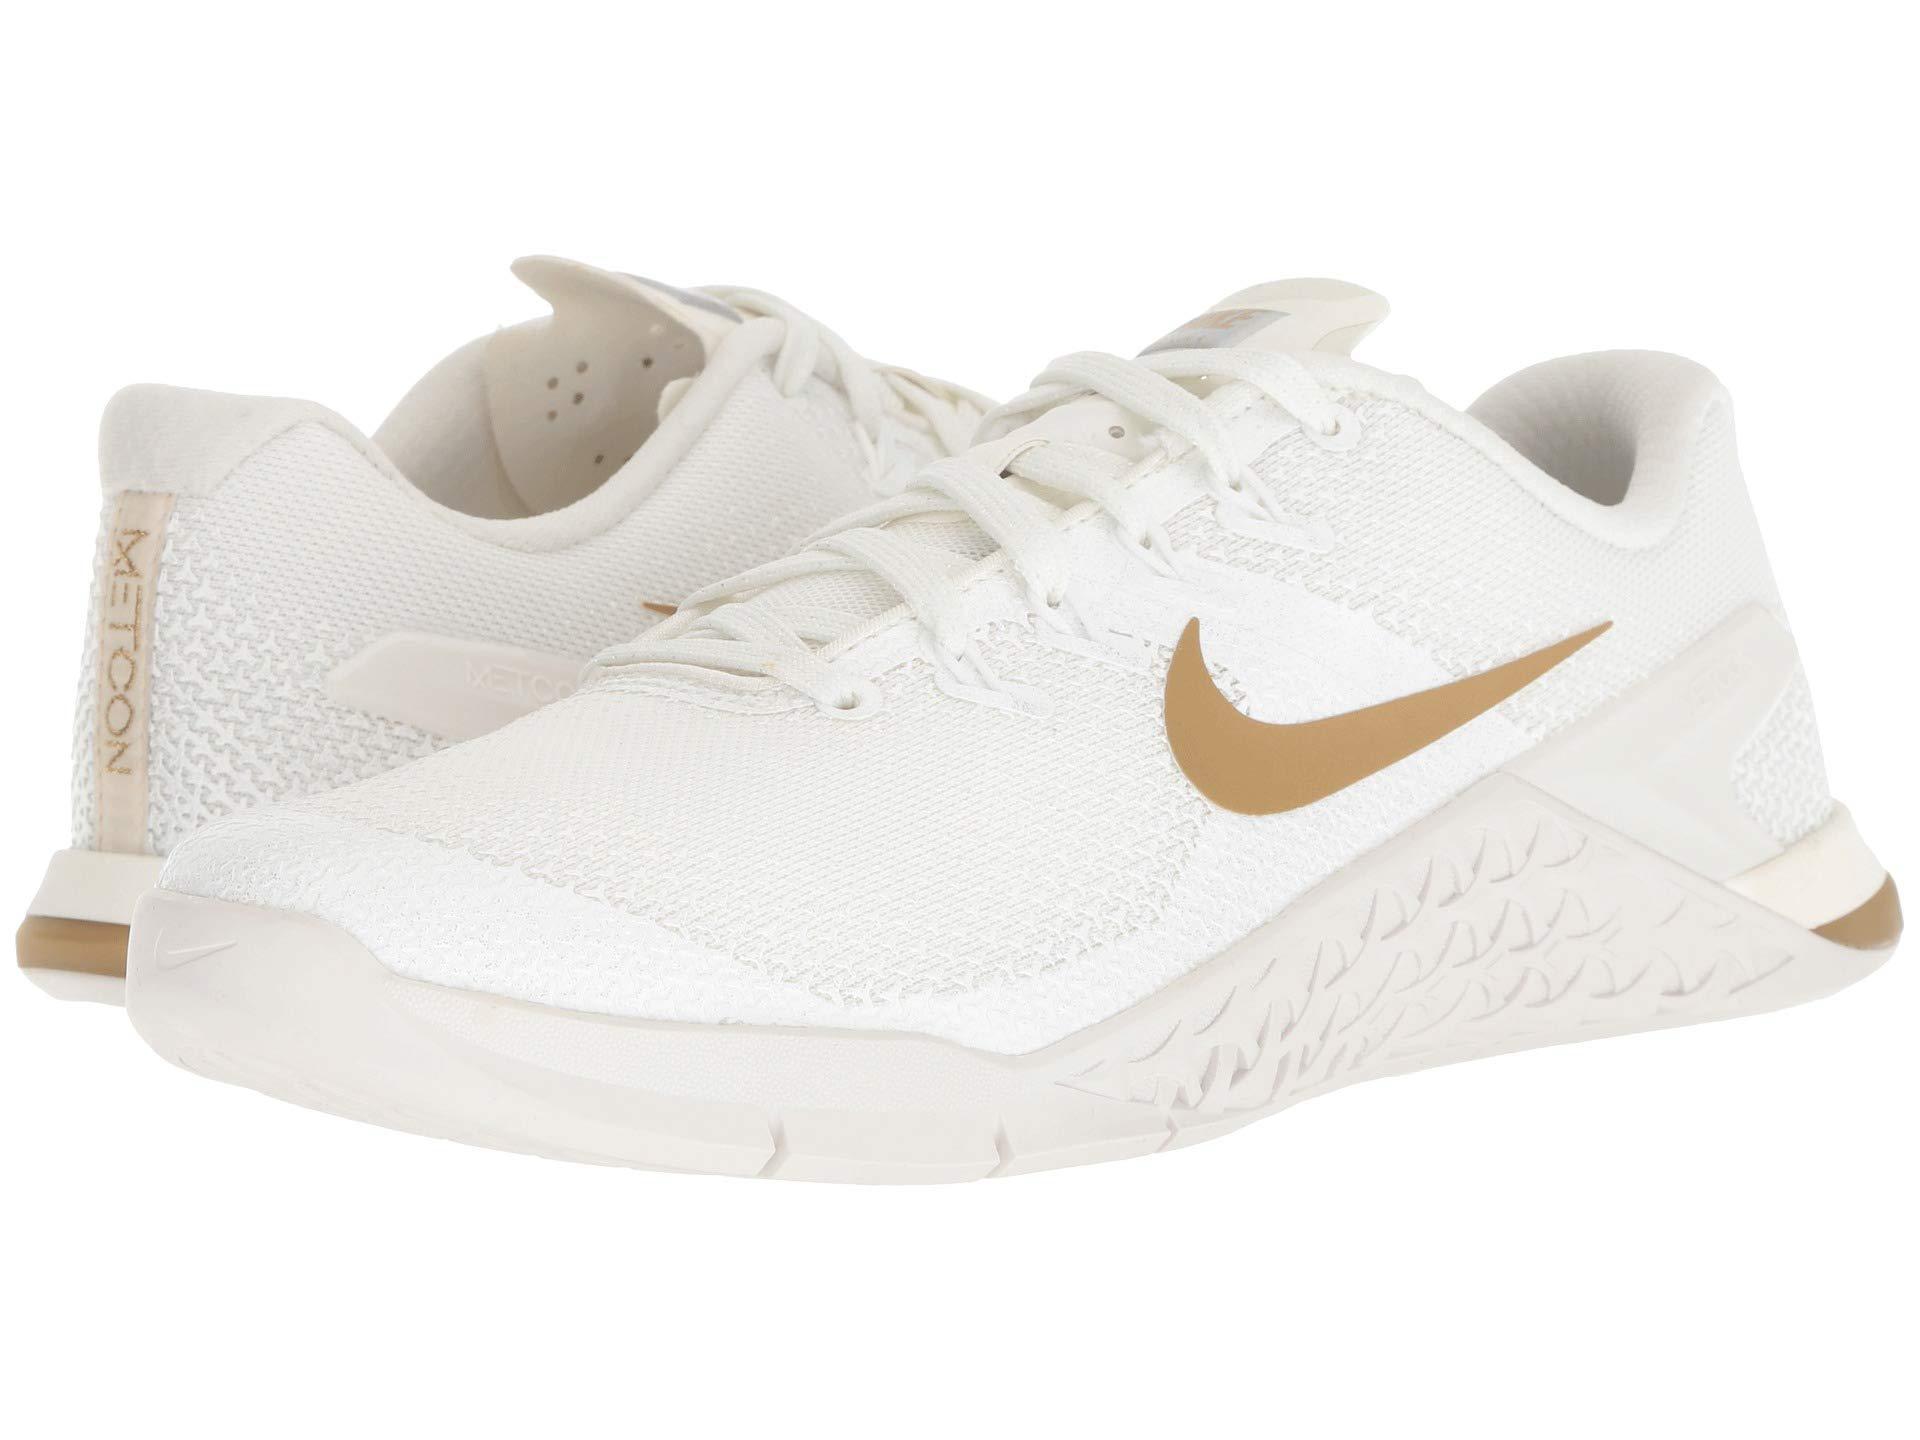 size 40 f8e8e 5580e Nike Metcon 4 Champagne (sail metallic Gold platinum Tint) Women s ...